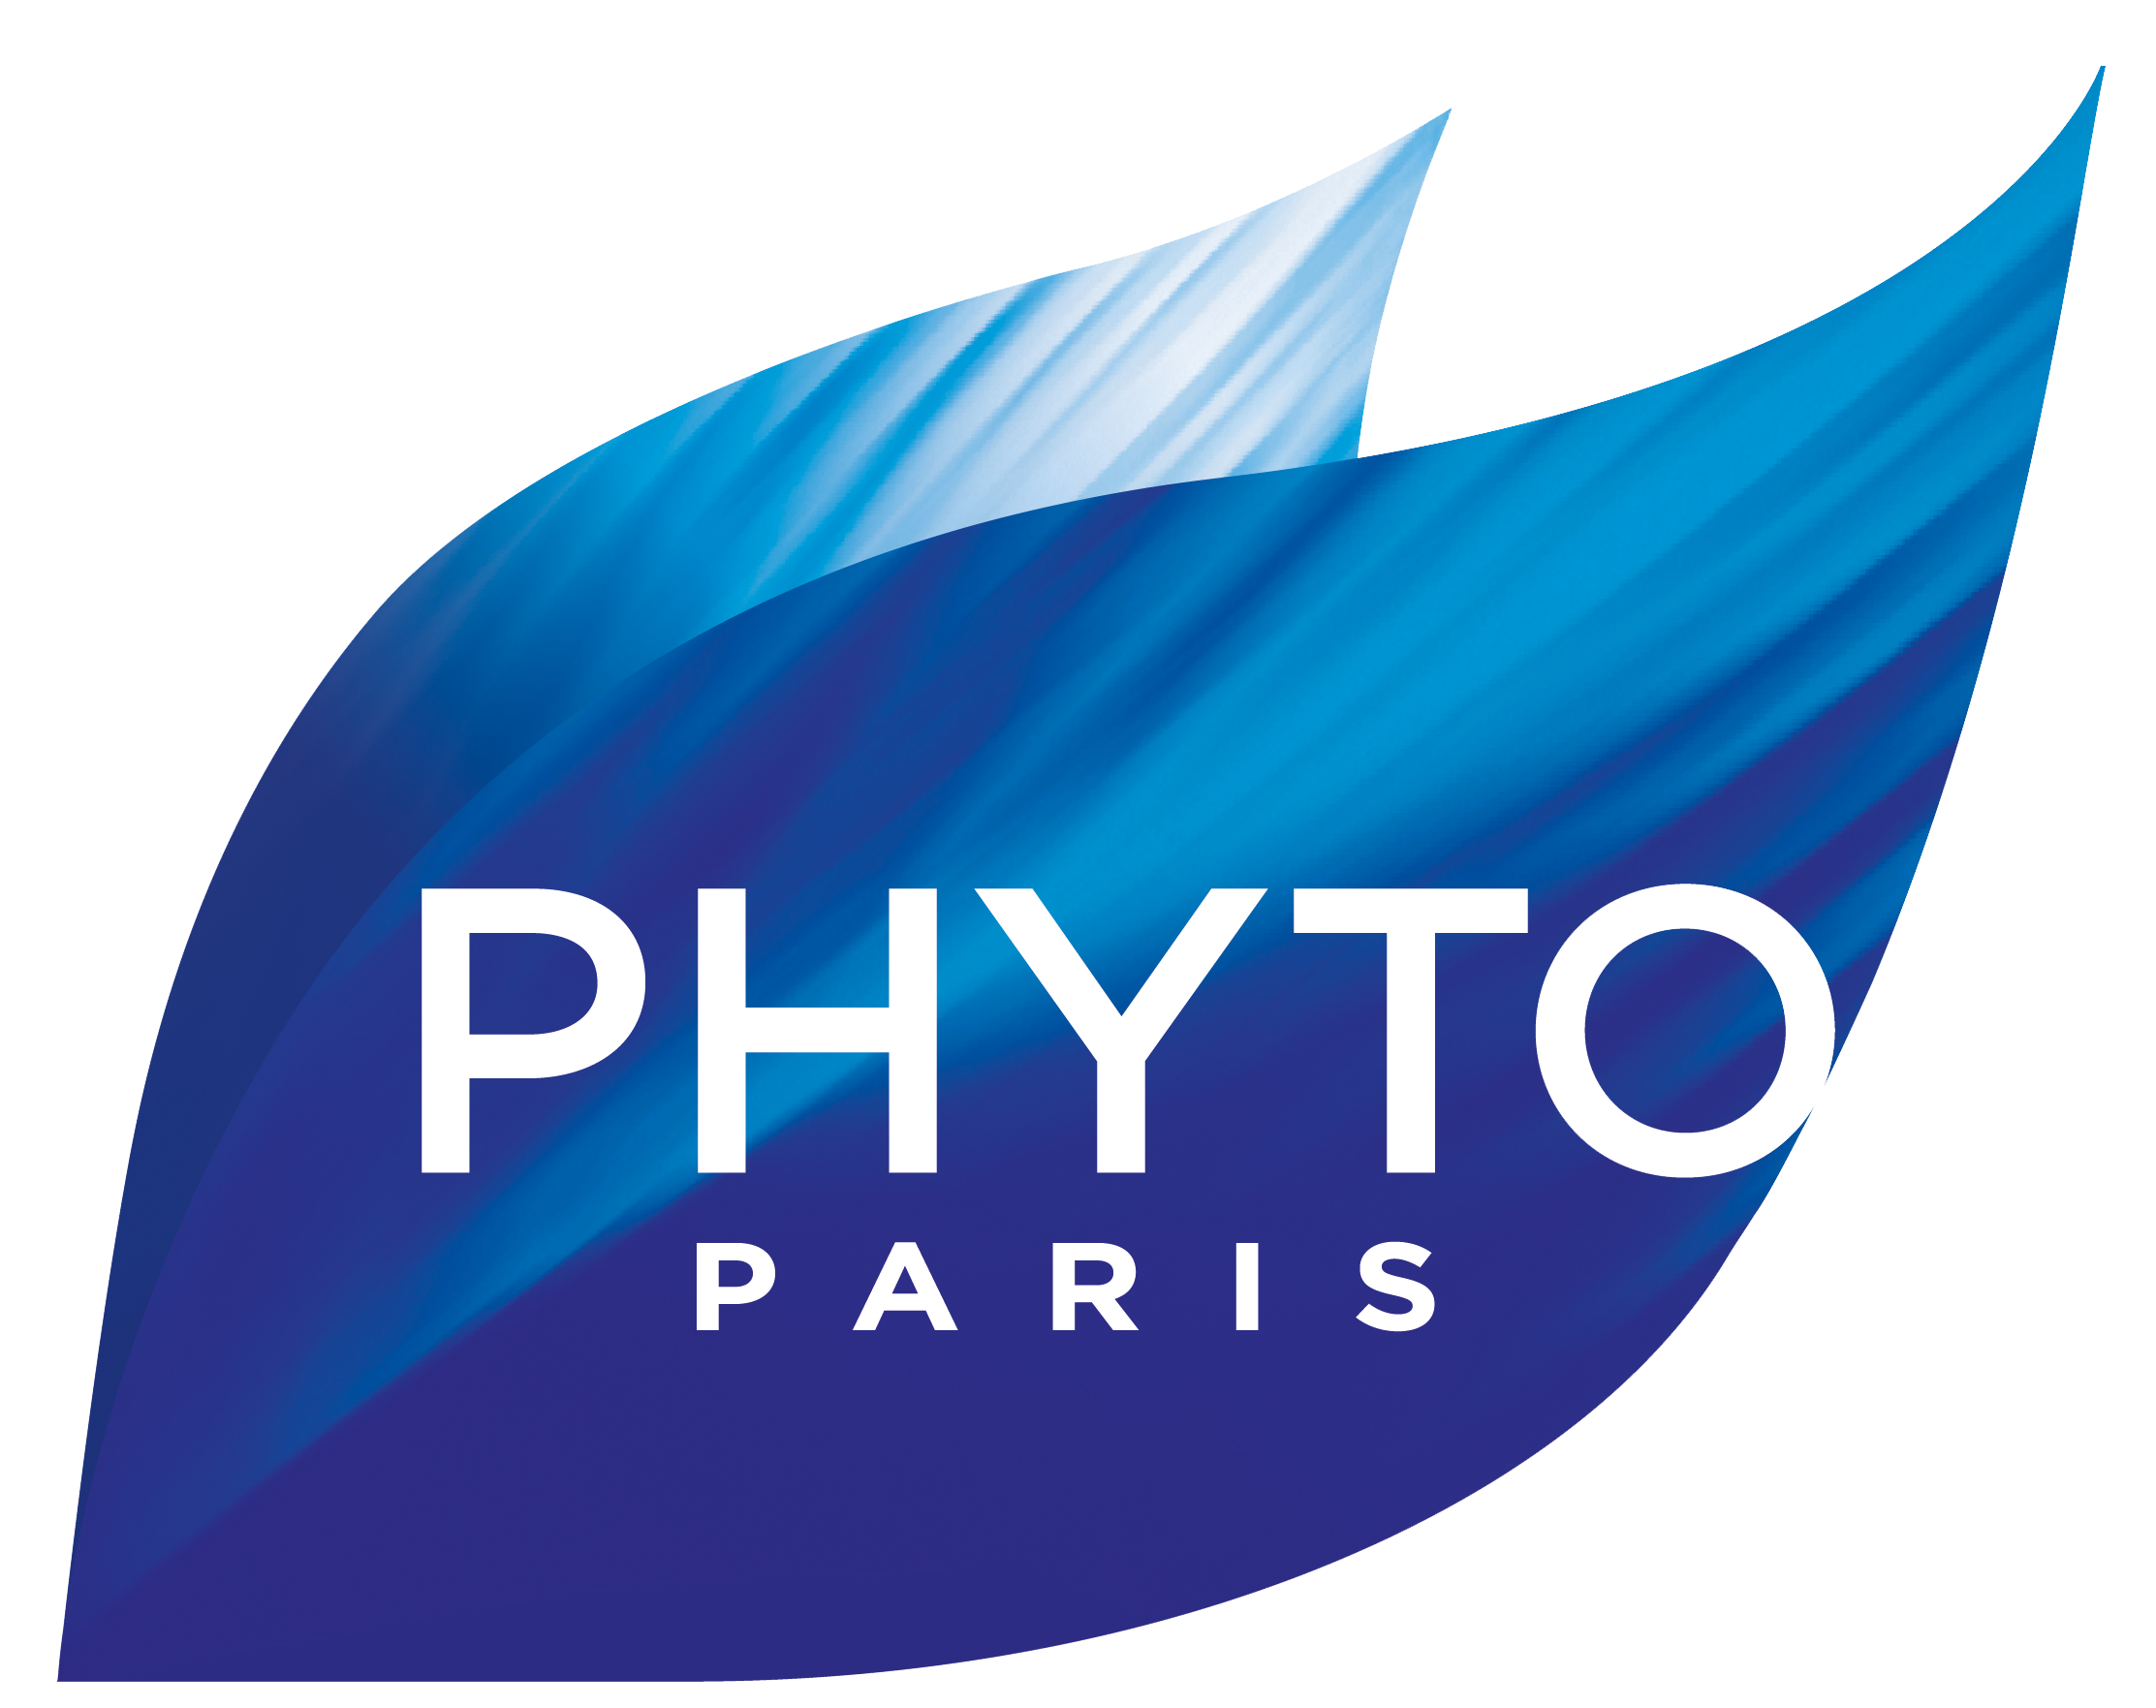 http://die-frau.com/upload/Logo_Phyto_300dpi.png